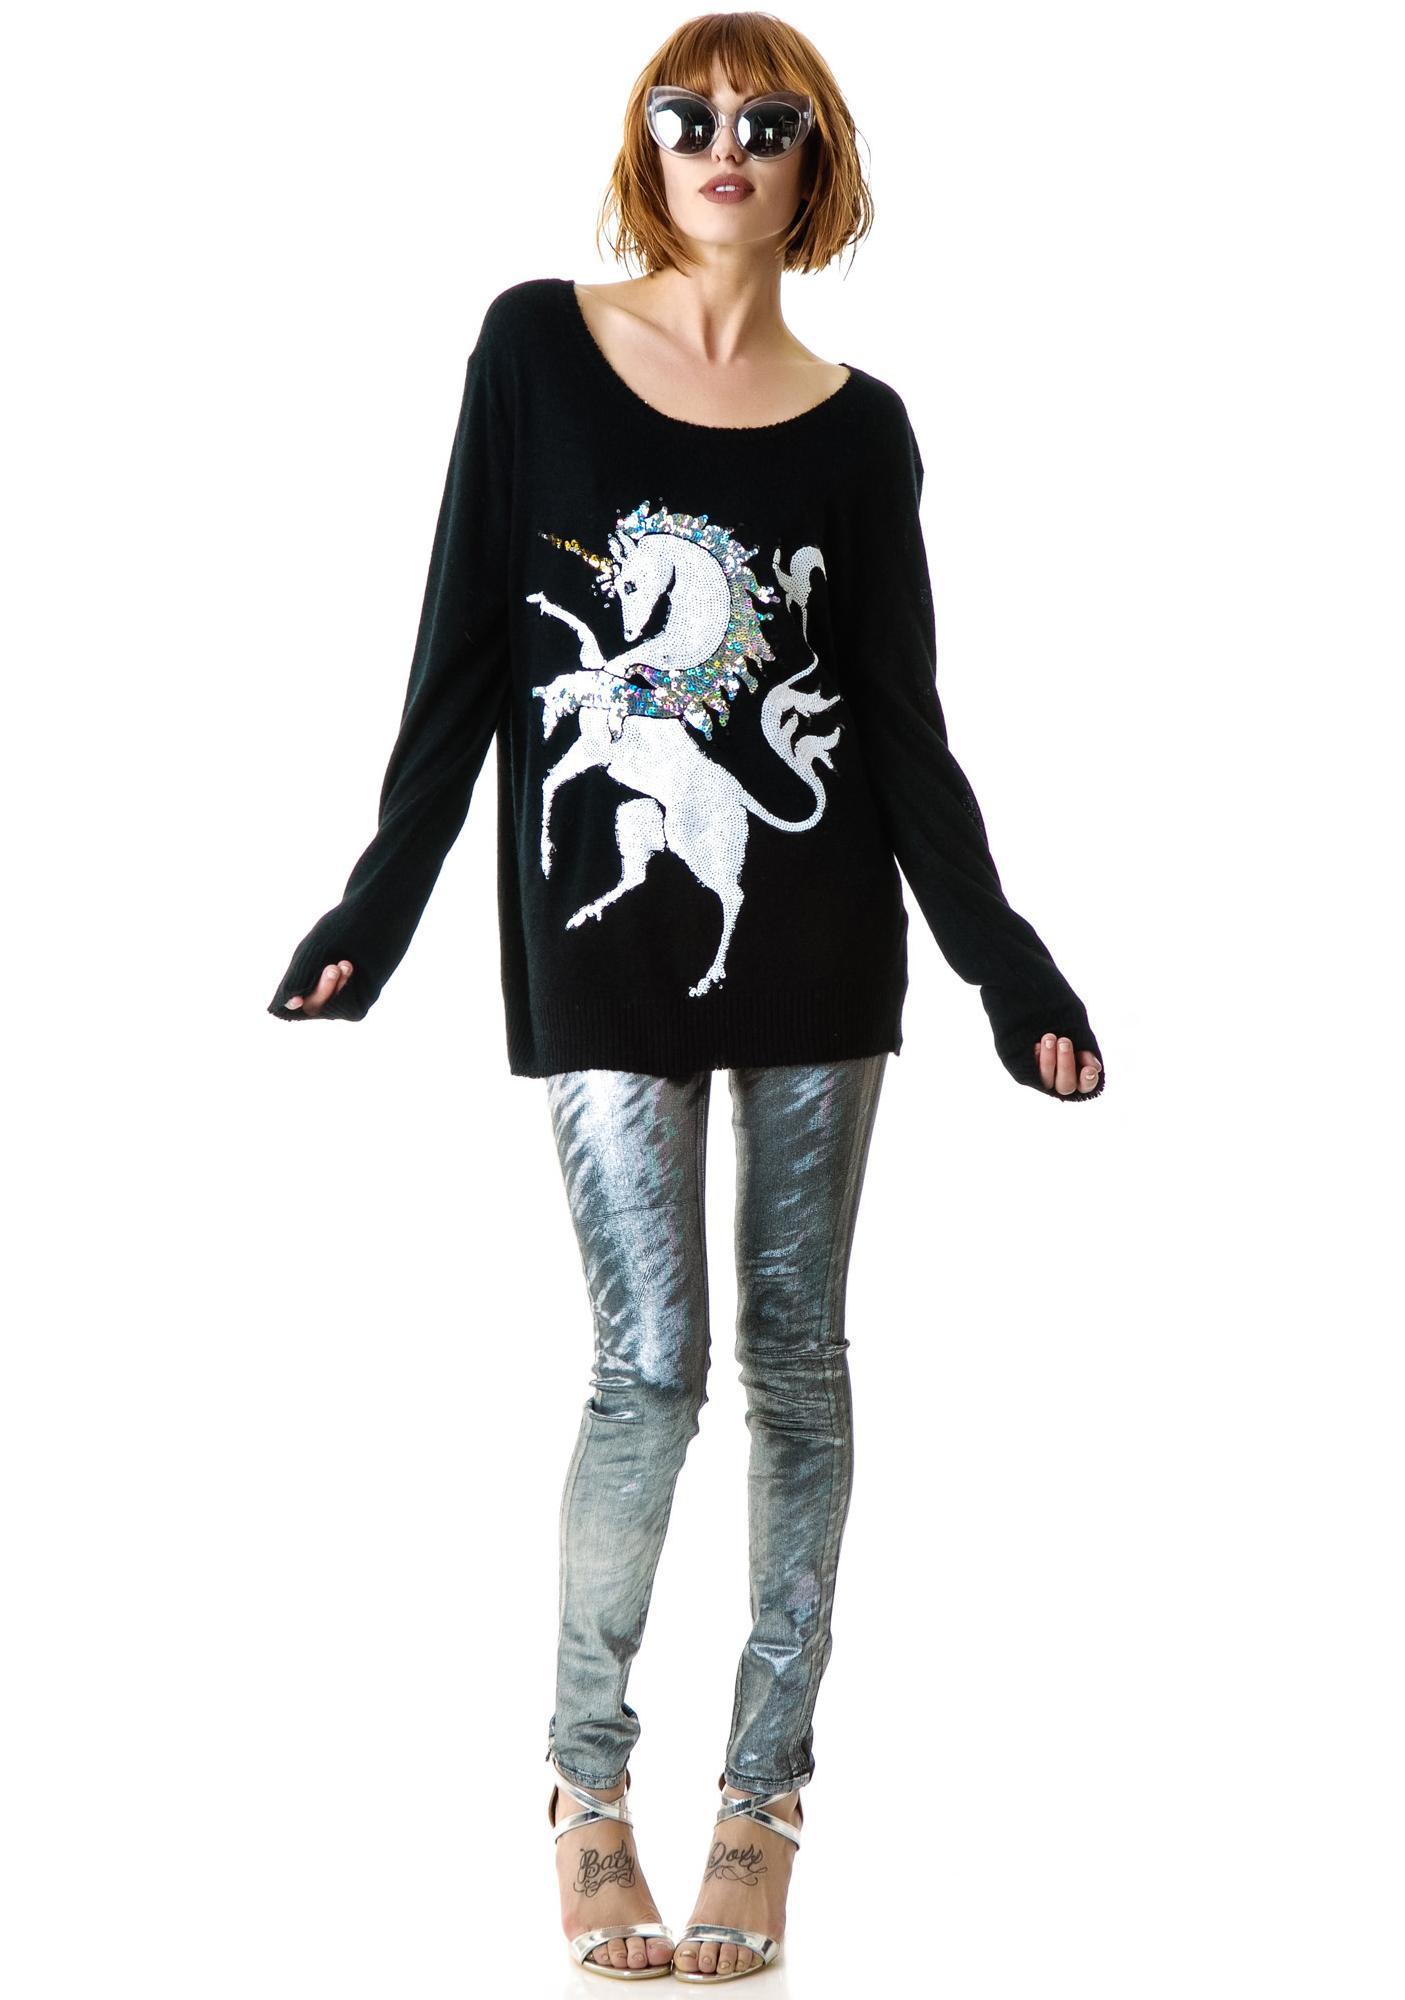 Wildfox Couture Unicorn Crew Neck Sweater